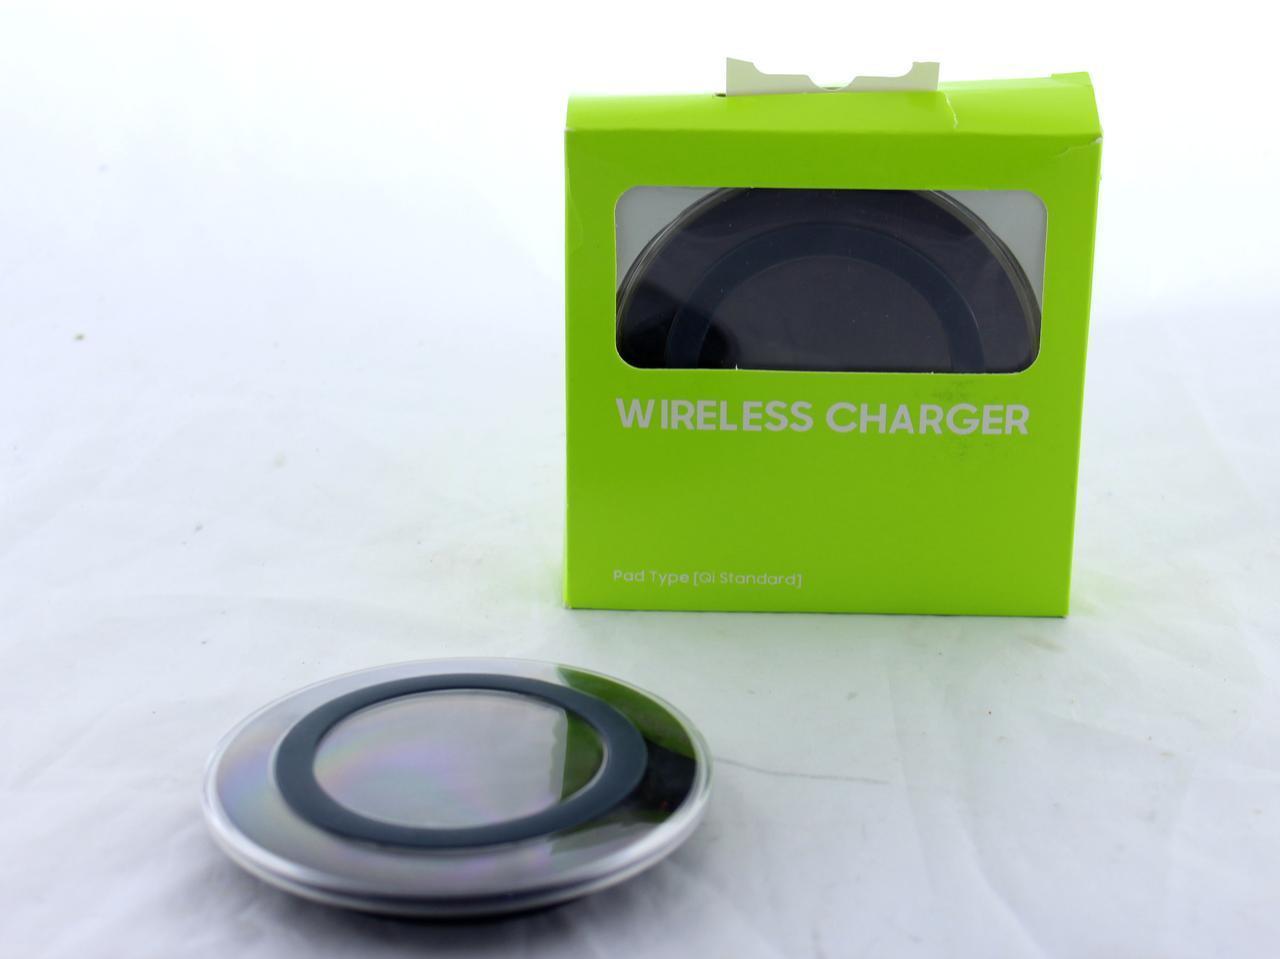 Адаптер для телефона беспроводной S6 QI wireless charger (ОПТОВАЯ цена от 240 шт)